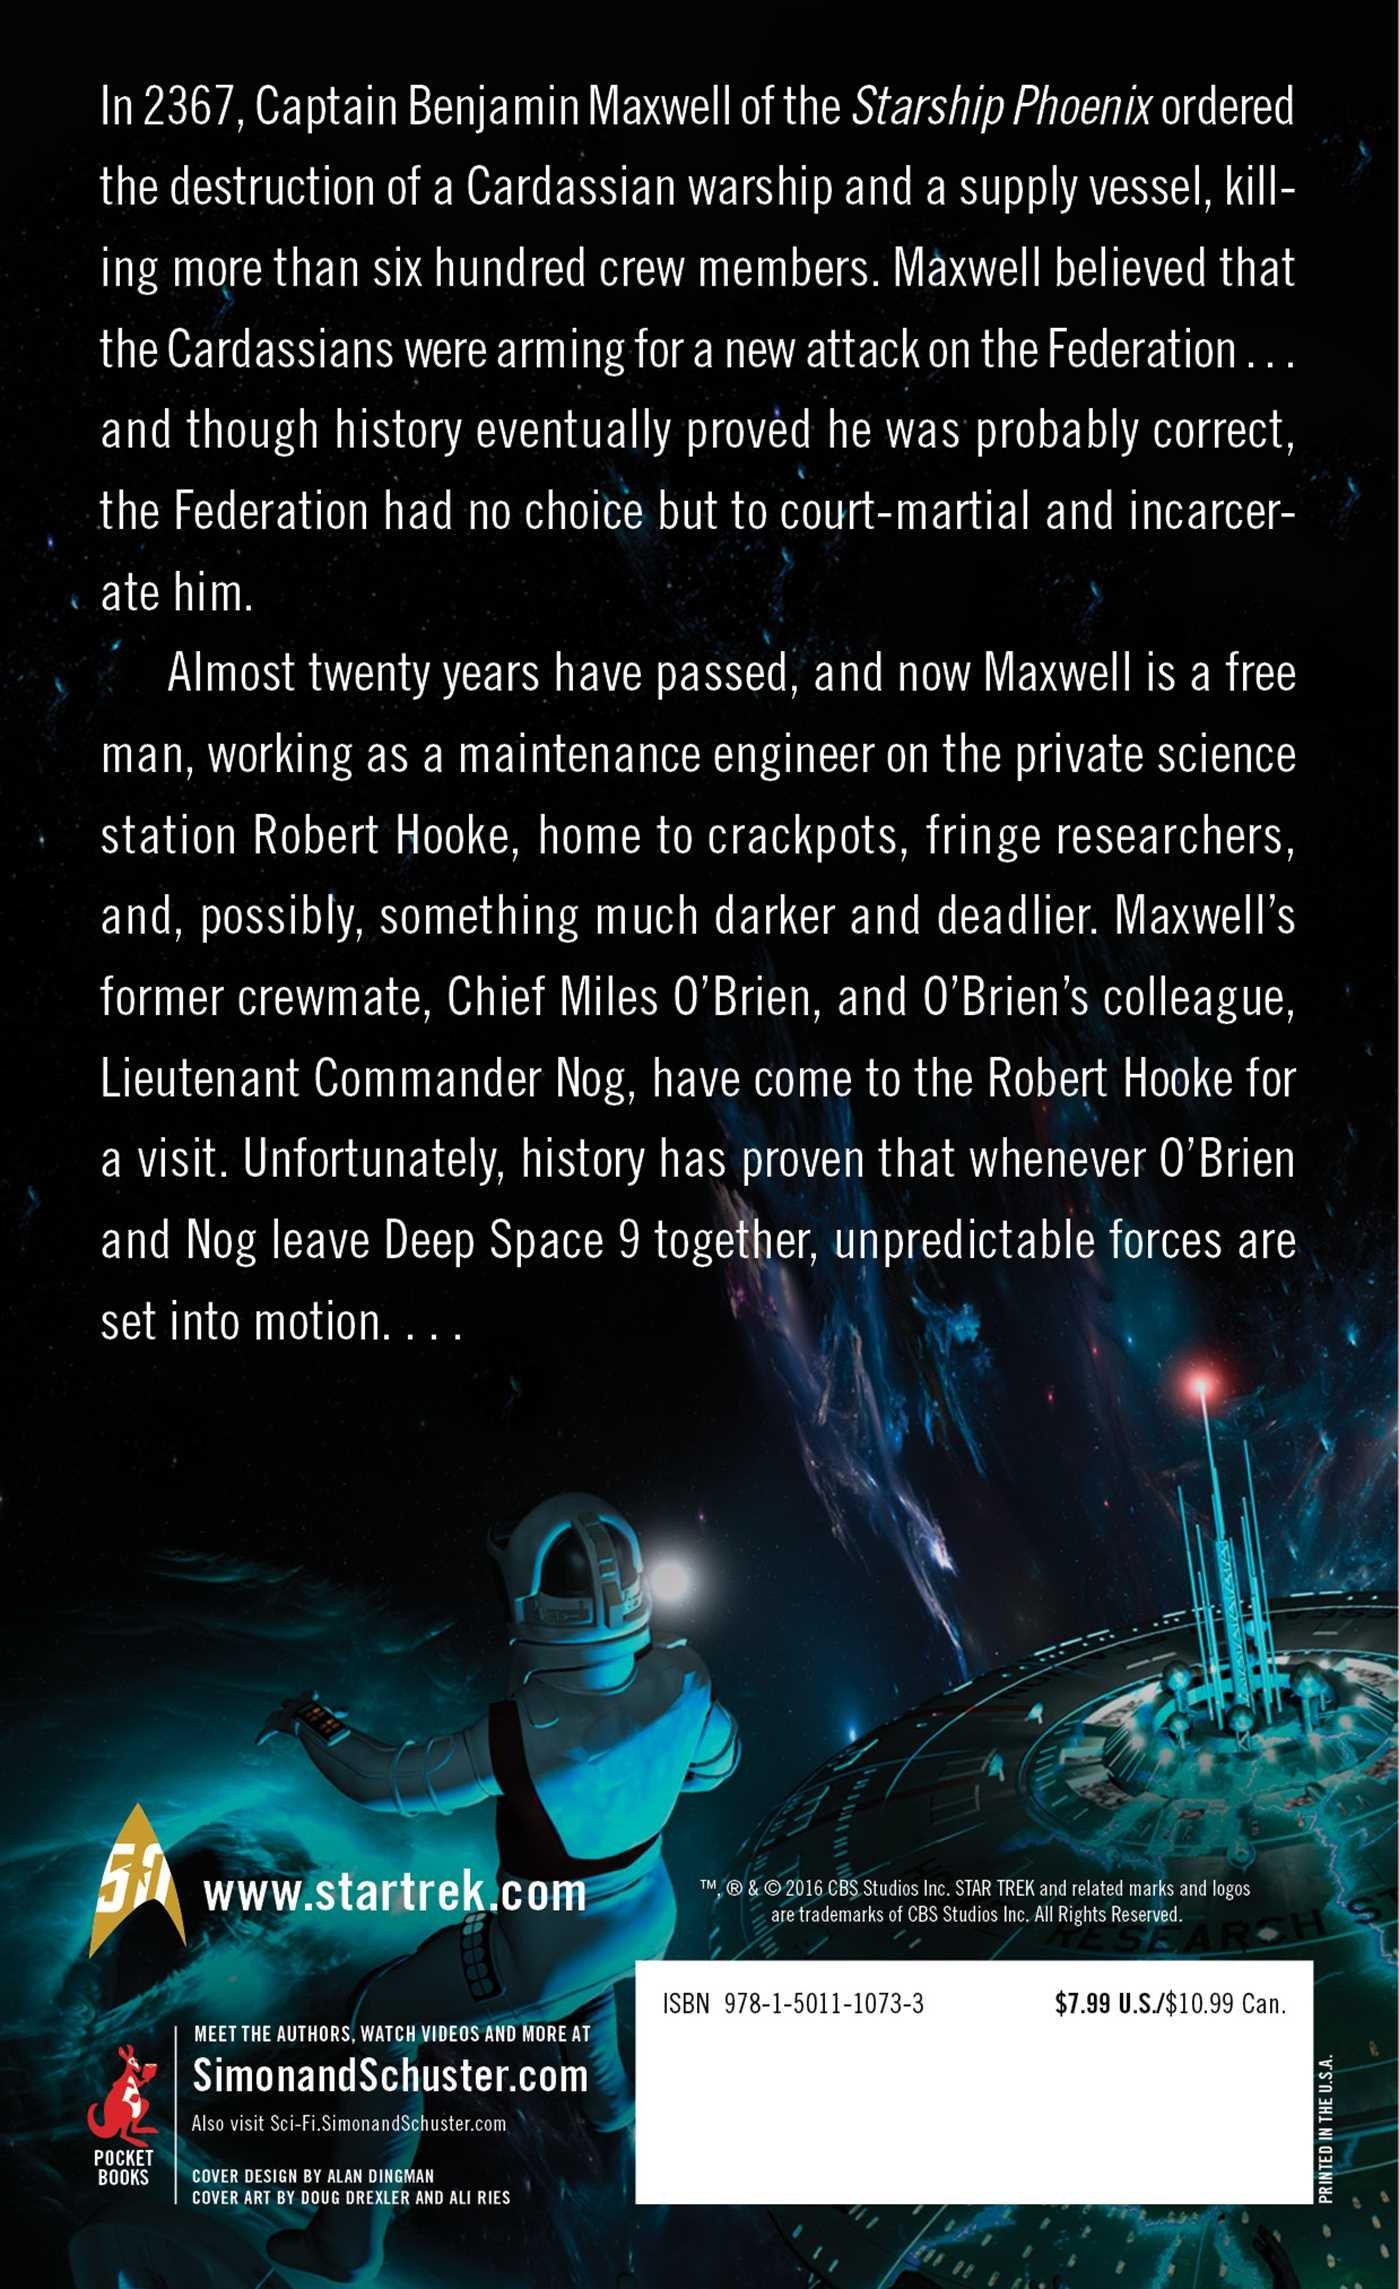 amazon com force and motion star trek deep space nine amazon com force and motion star trek deep space nine 9781501110733 jeffrey lang books